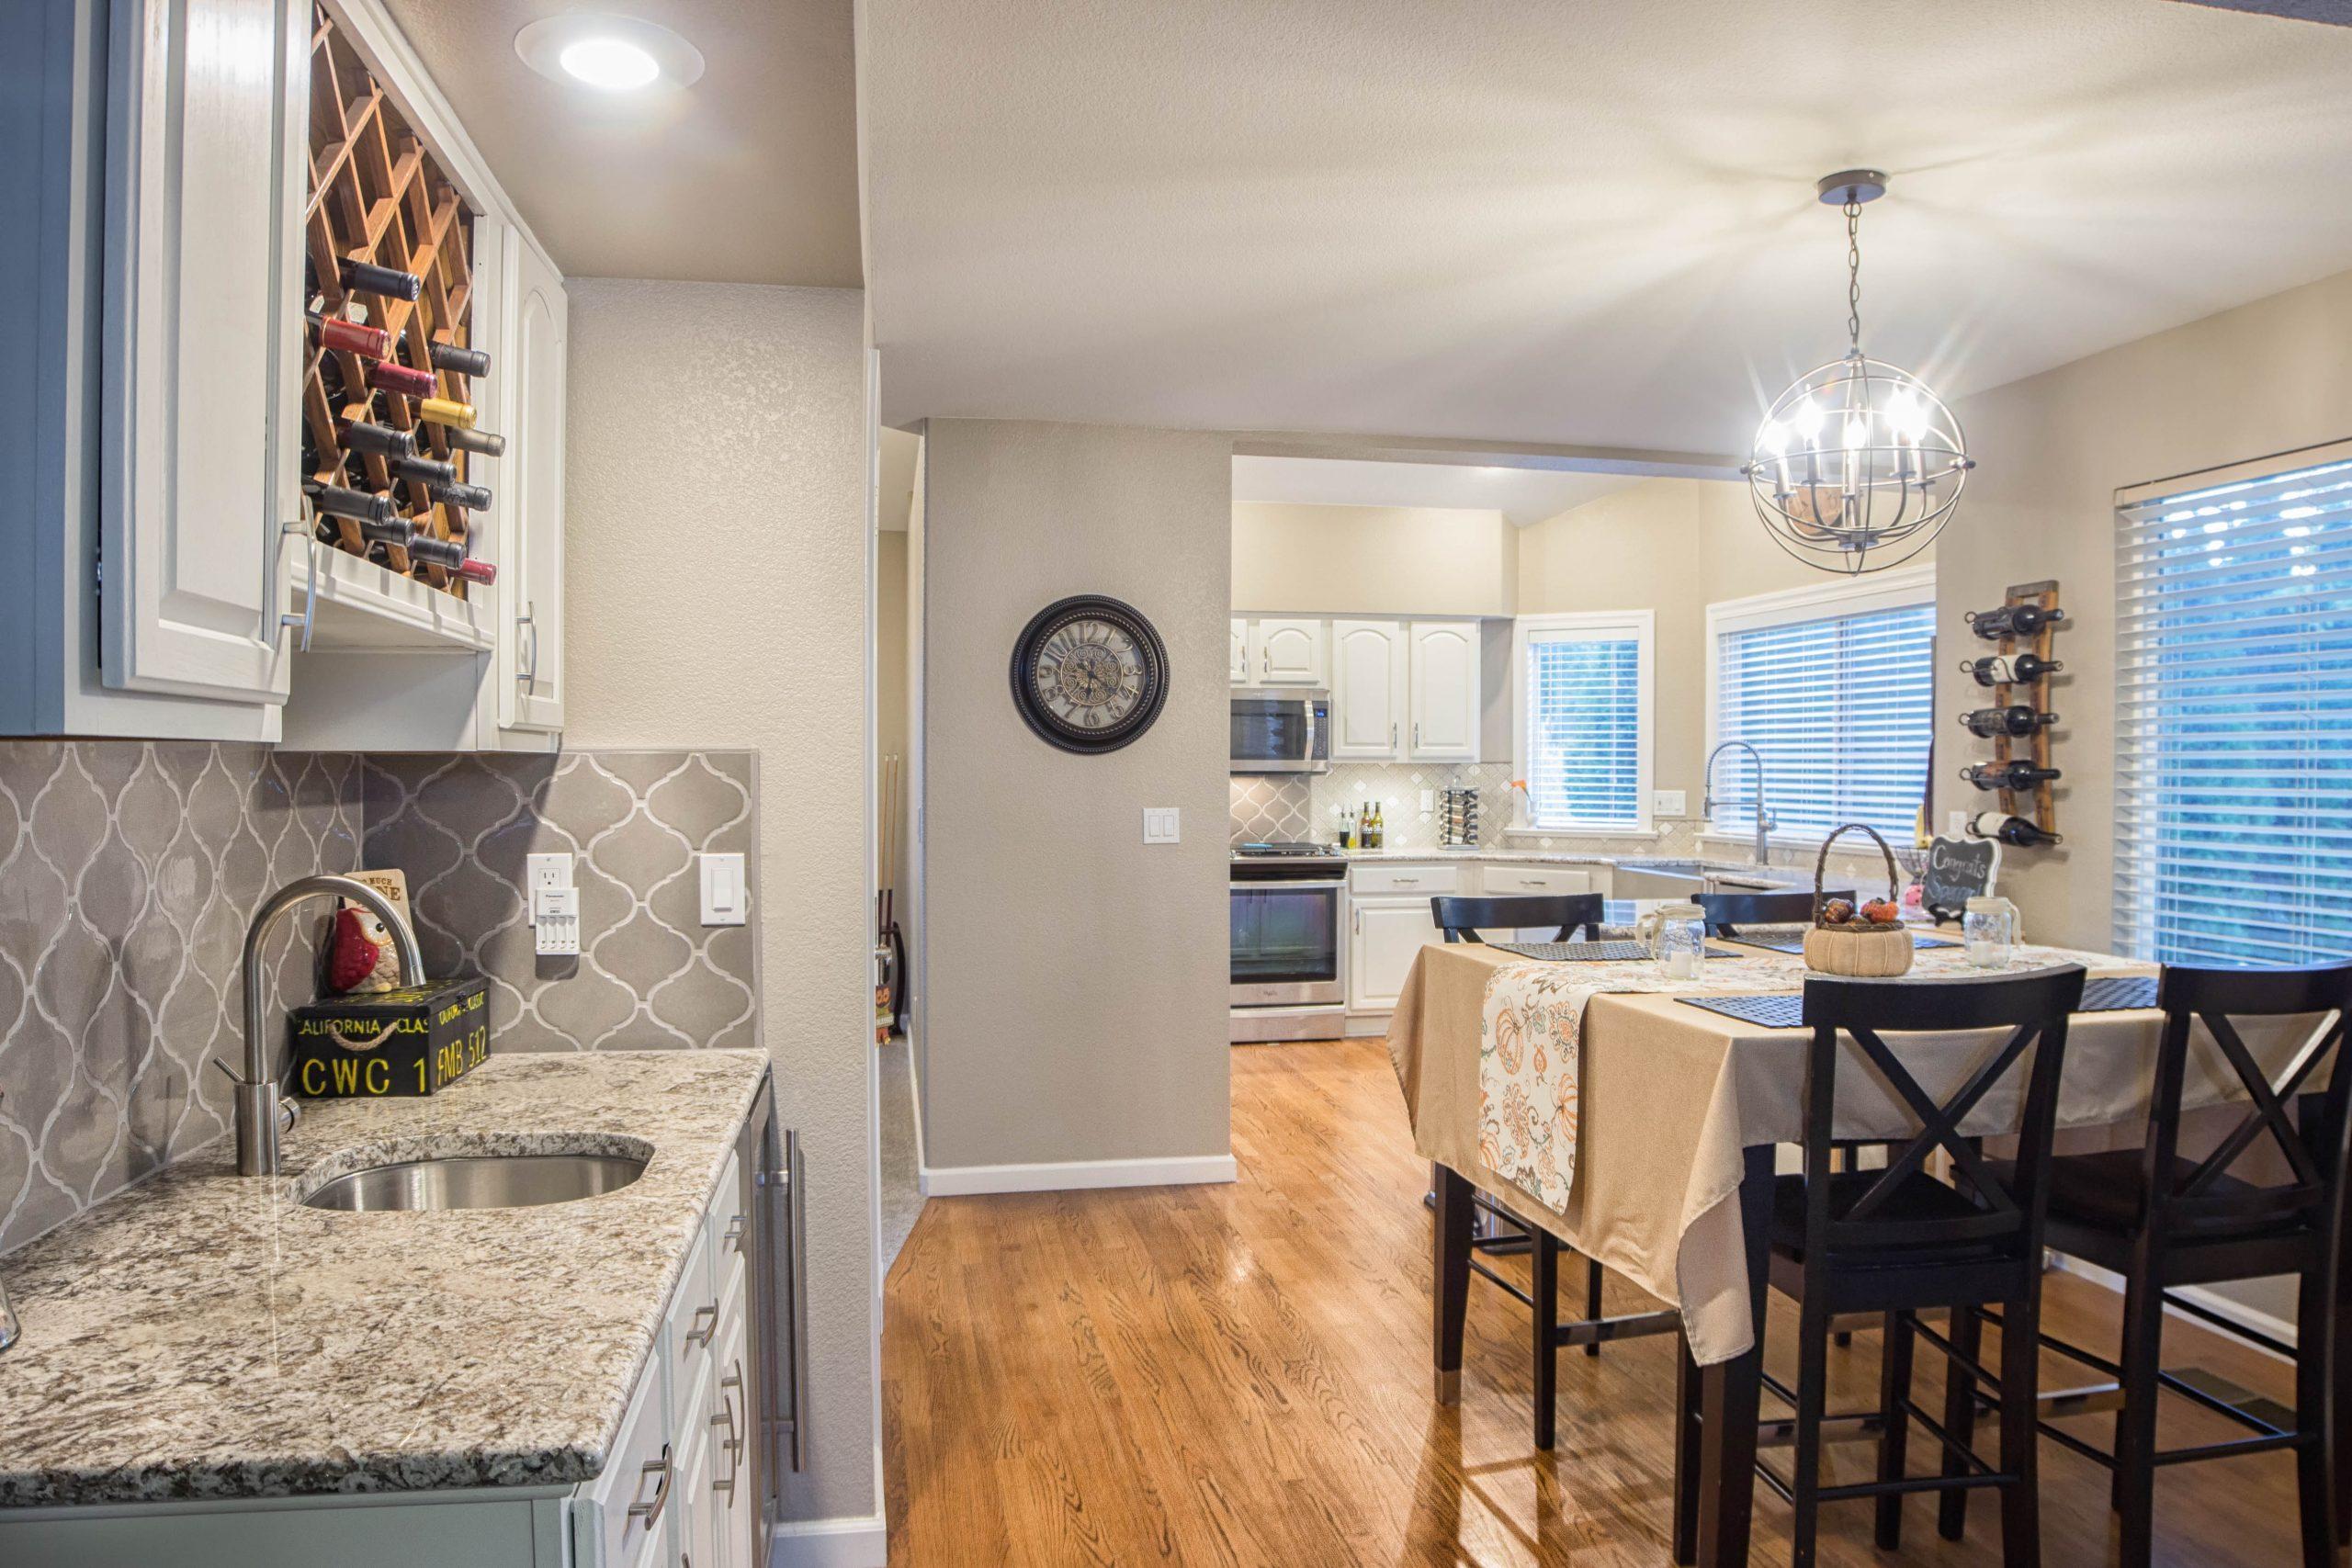 Home Renovation Cost Breakdown